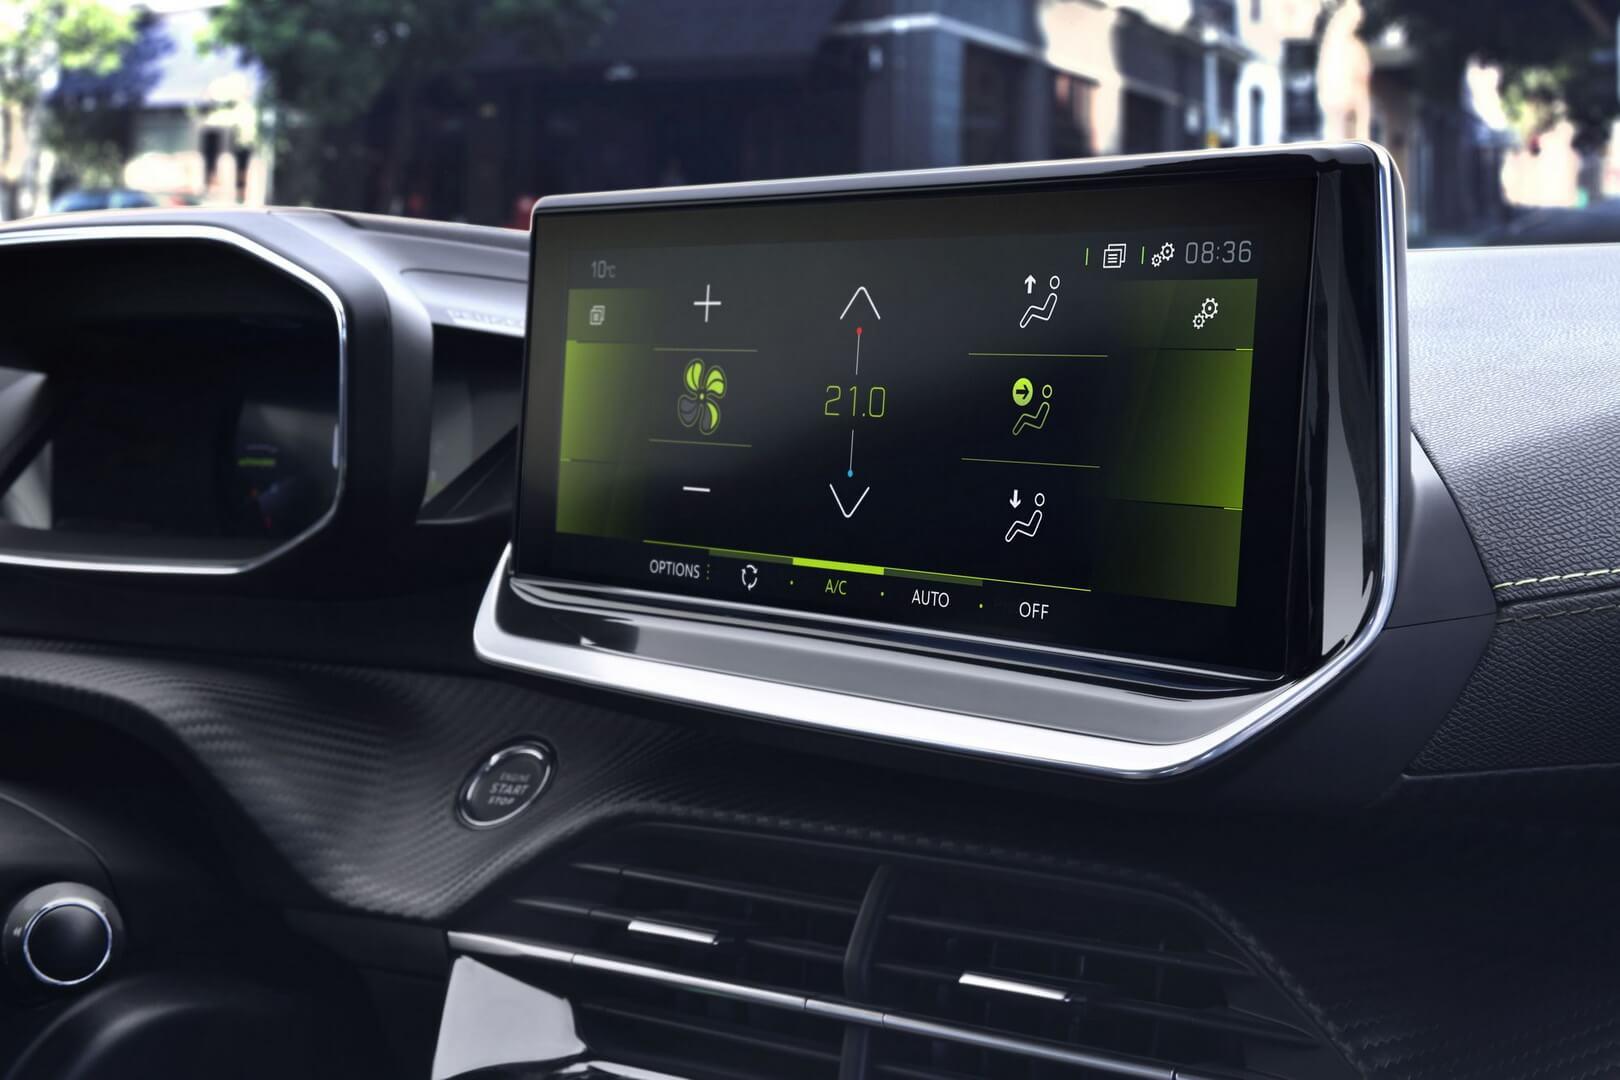 Мультимедийная система Peugeot e-208